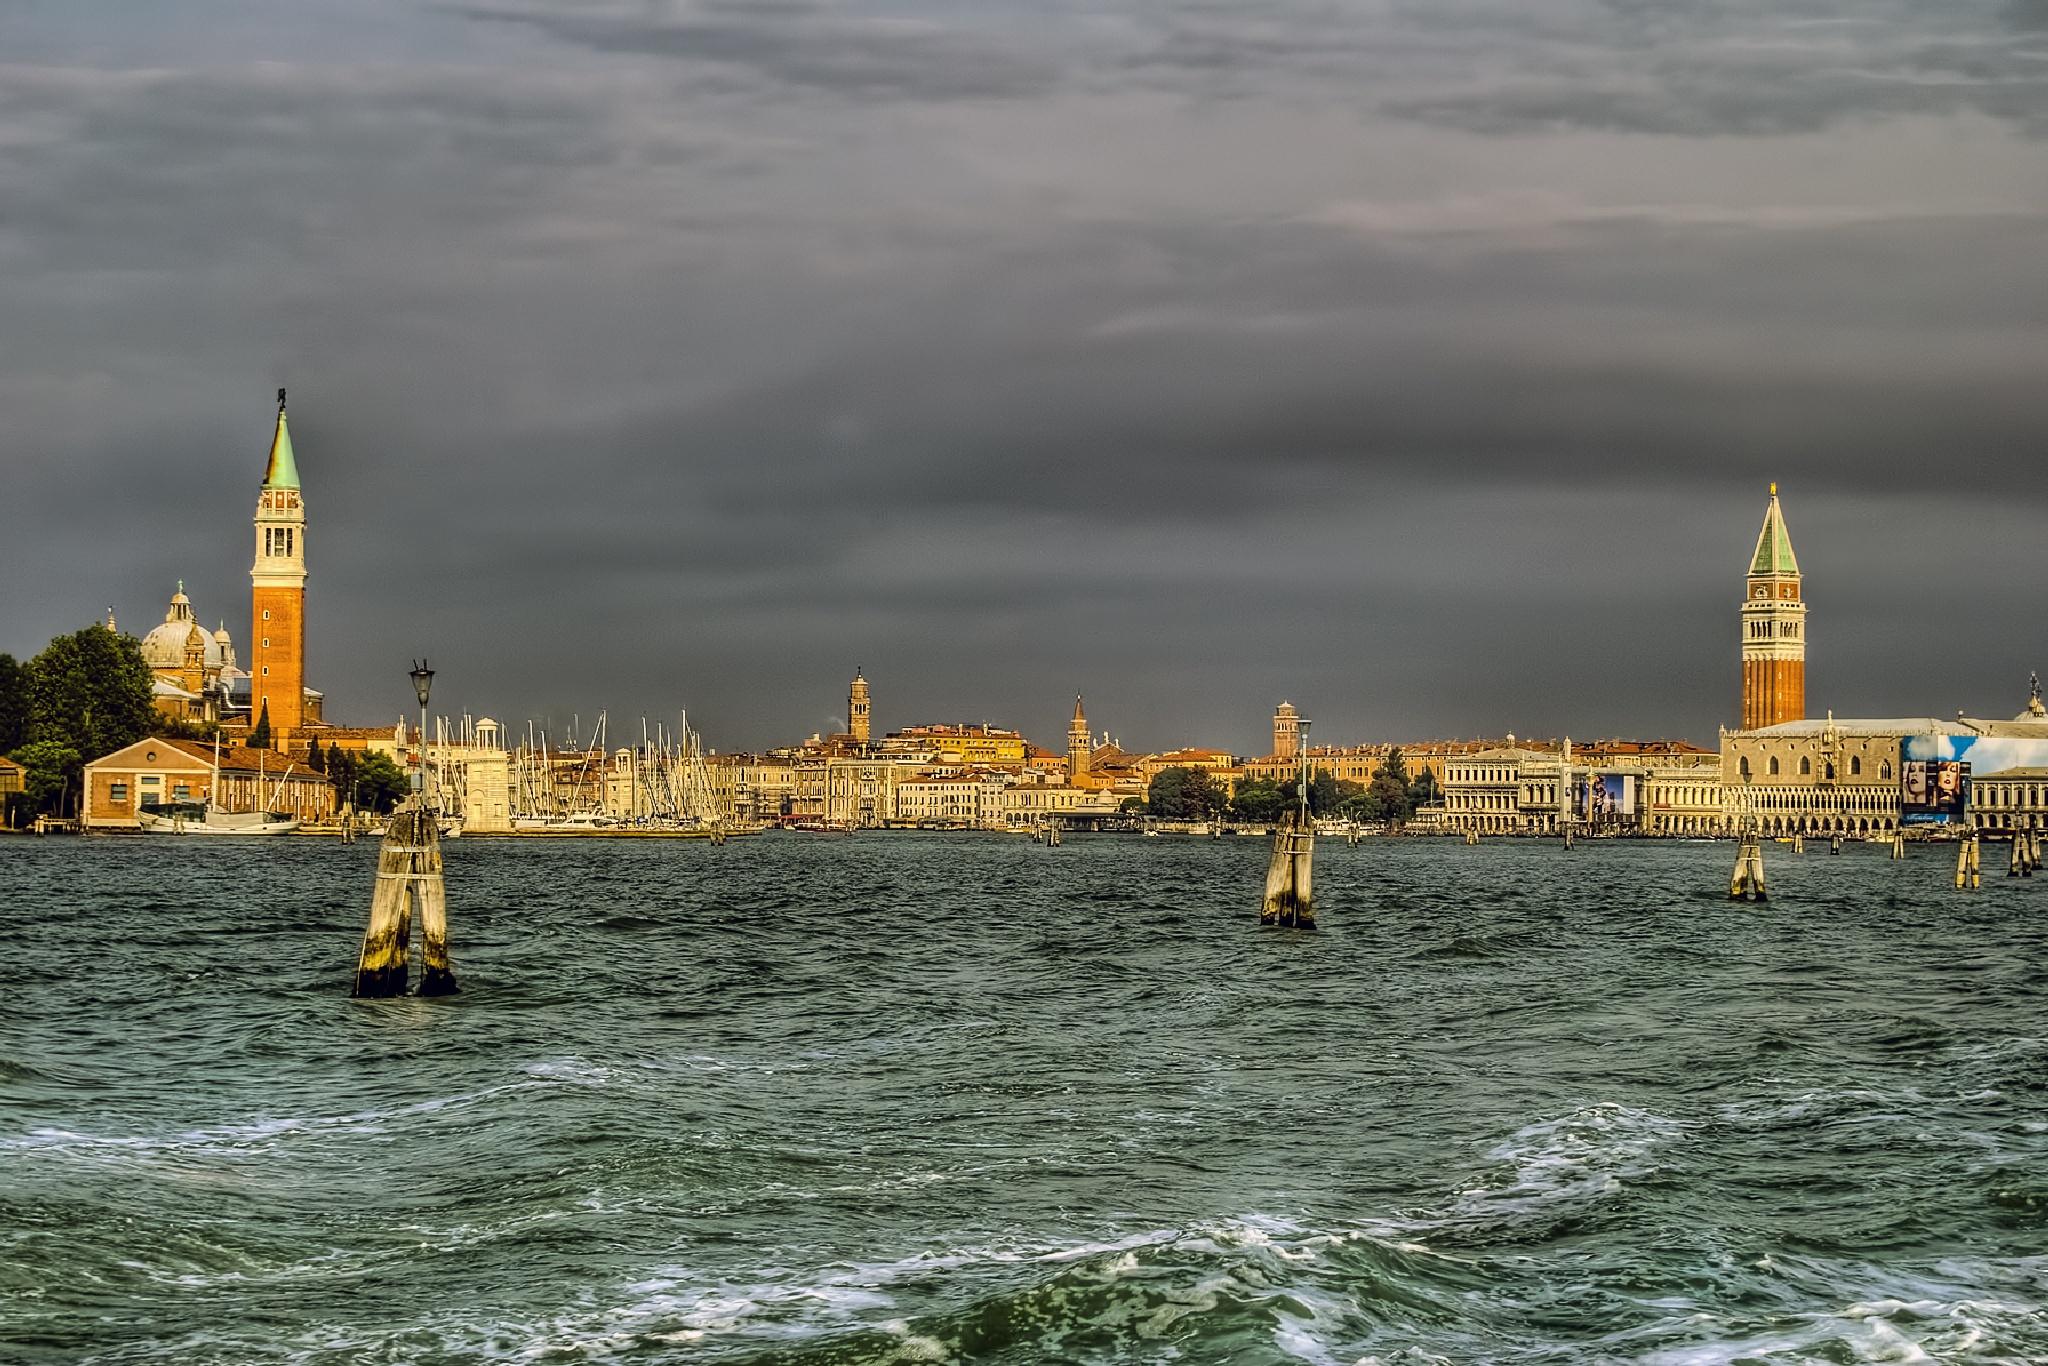 Venice seen from the boat by MarieJirousek